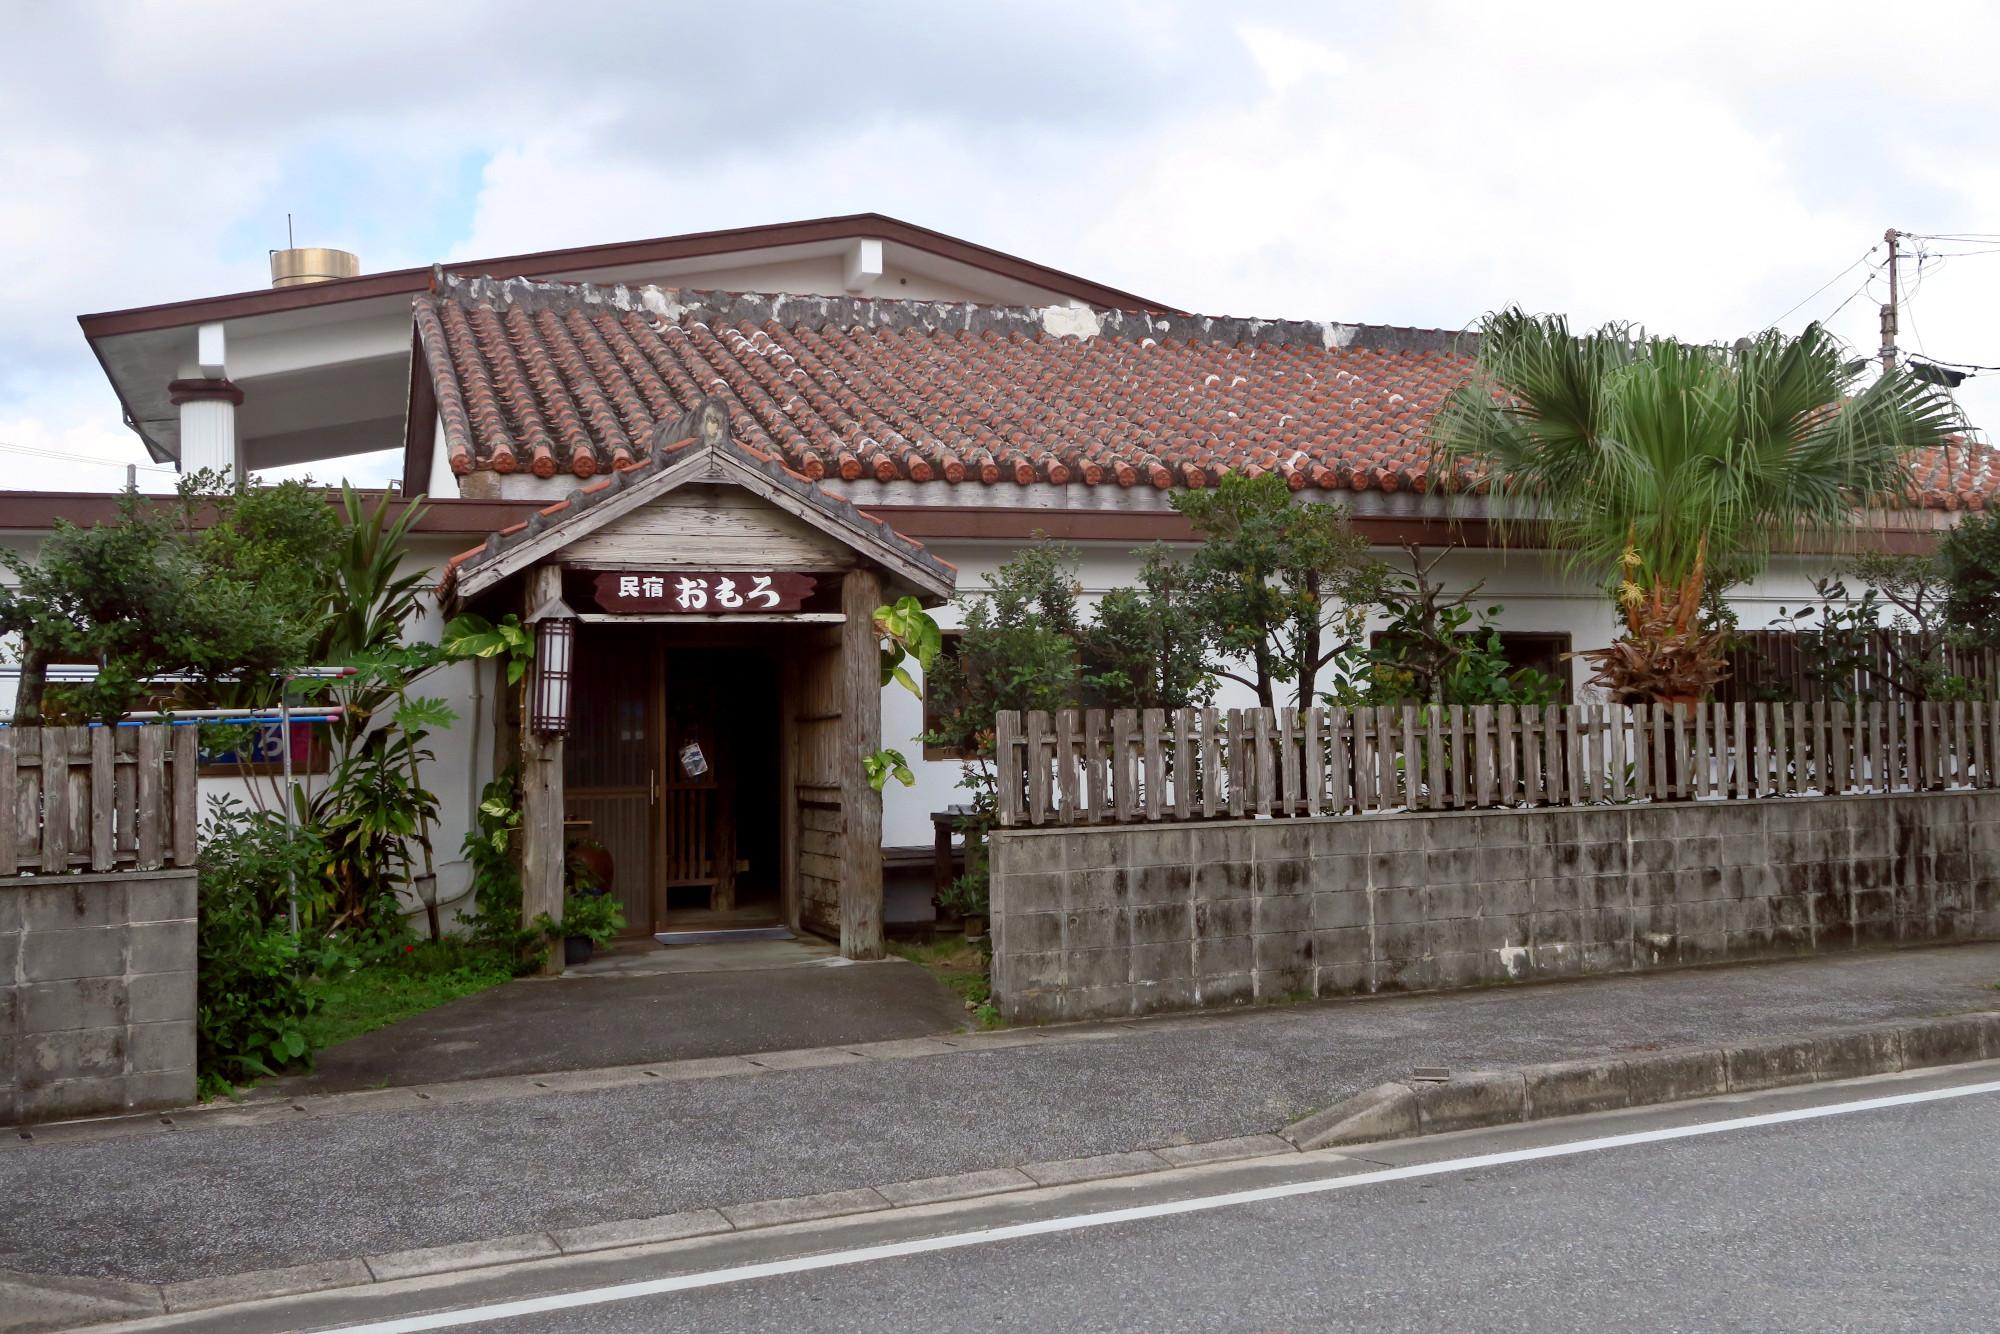 Omoro guesthouse Yonaguni Okinawa Japan